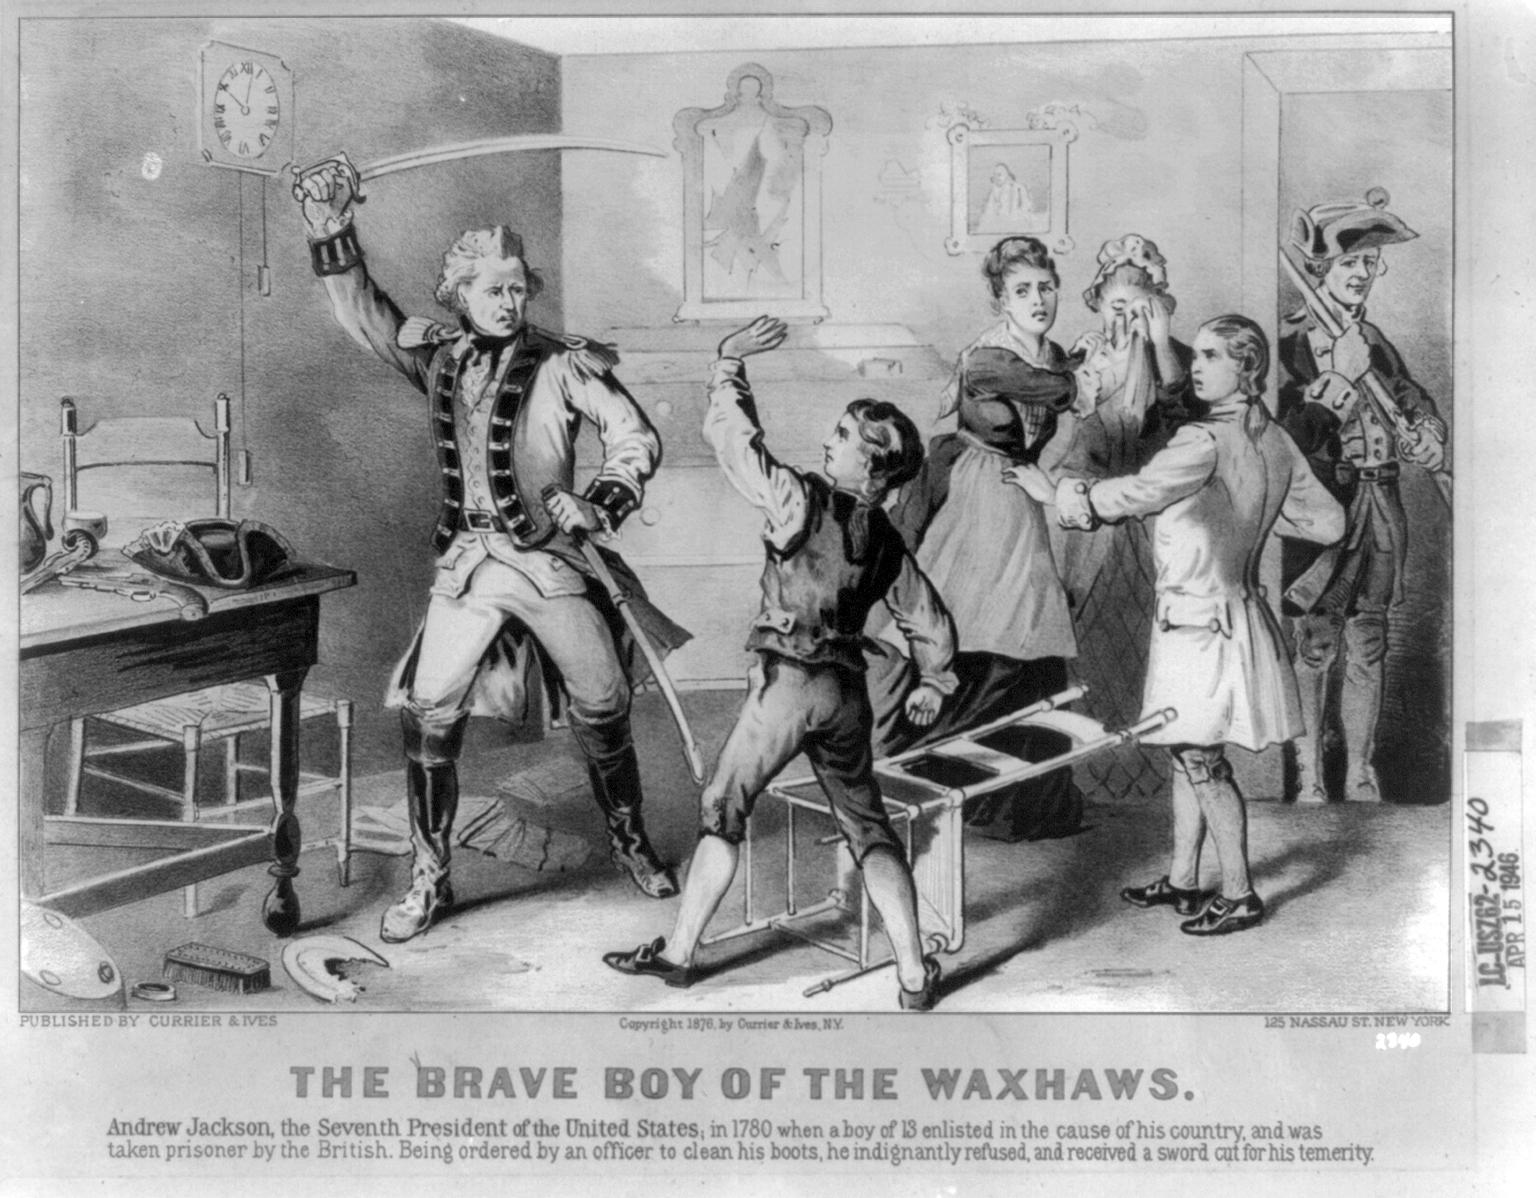 Kitchen Cabinet Andrew Jackson andrew jackson inforgraphic -marrtoni sanchez [infographic]